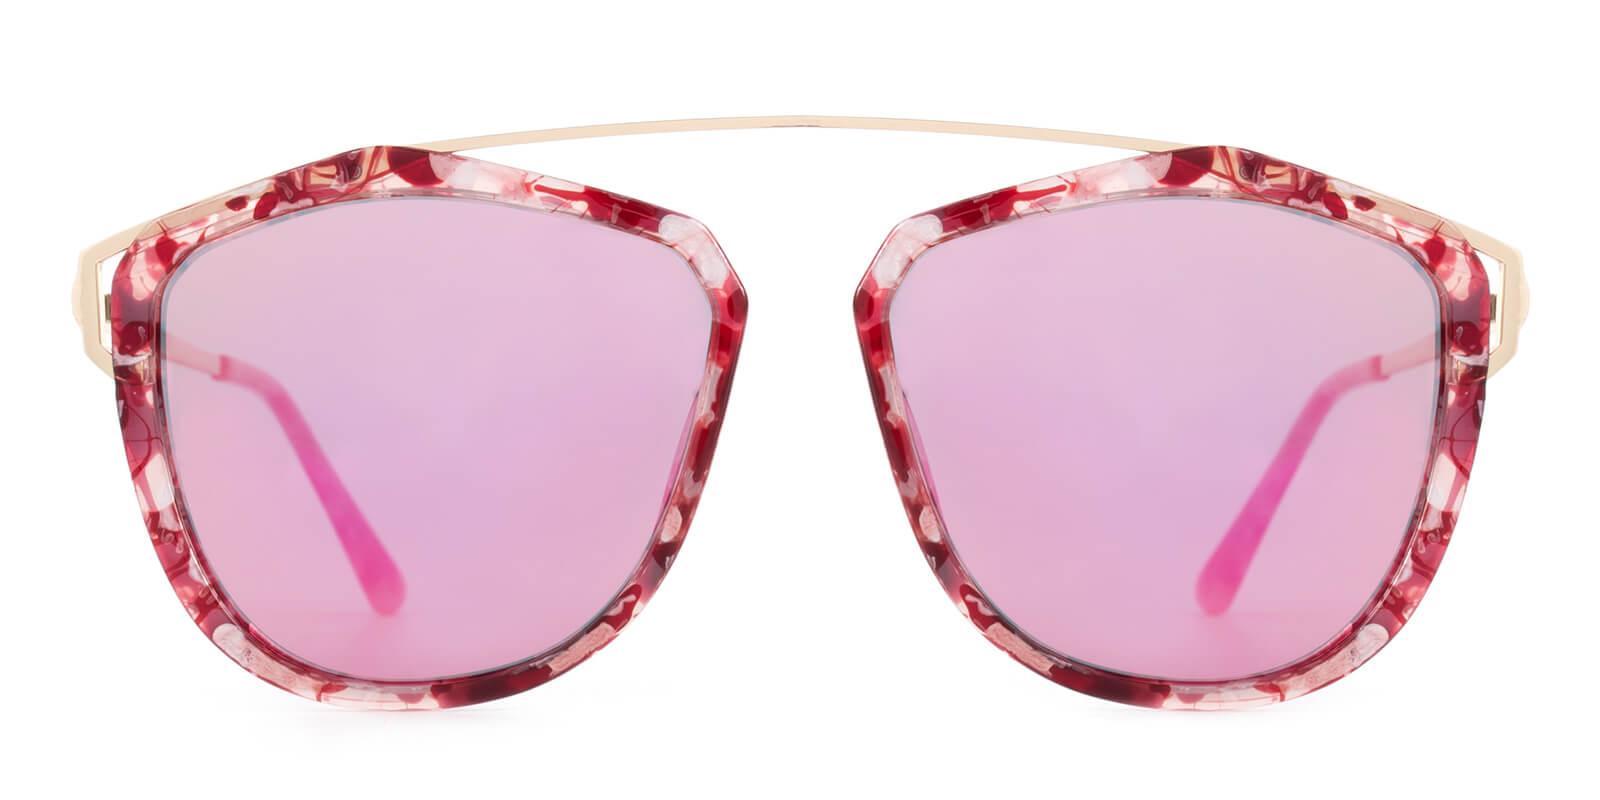 Phantom-Pink-Aviator-Metal / Combination / TR-Sunglasses-additional2